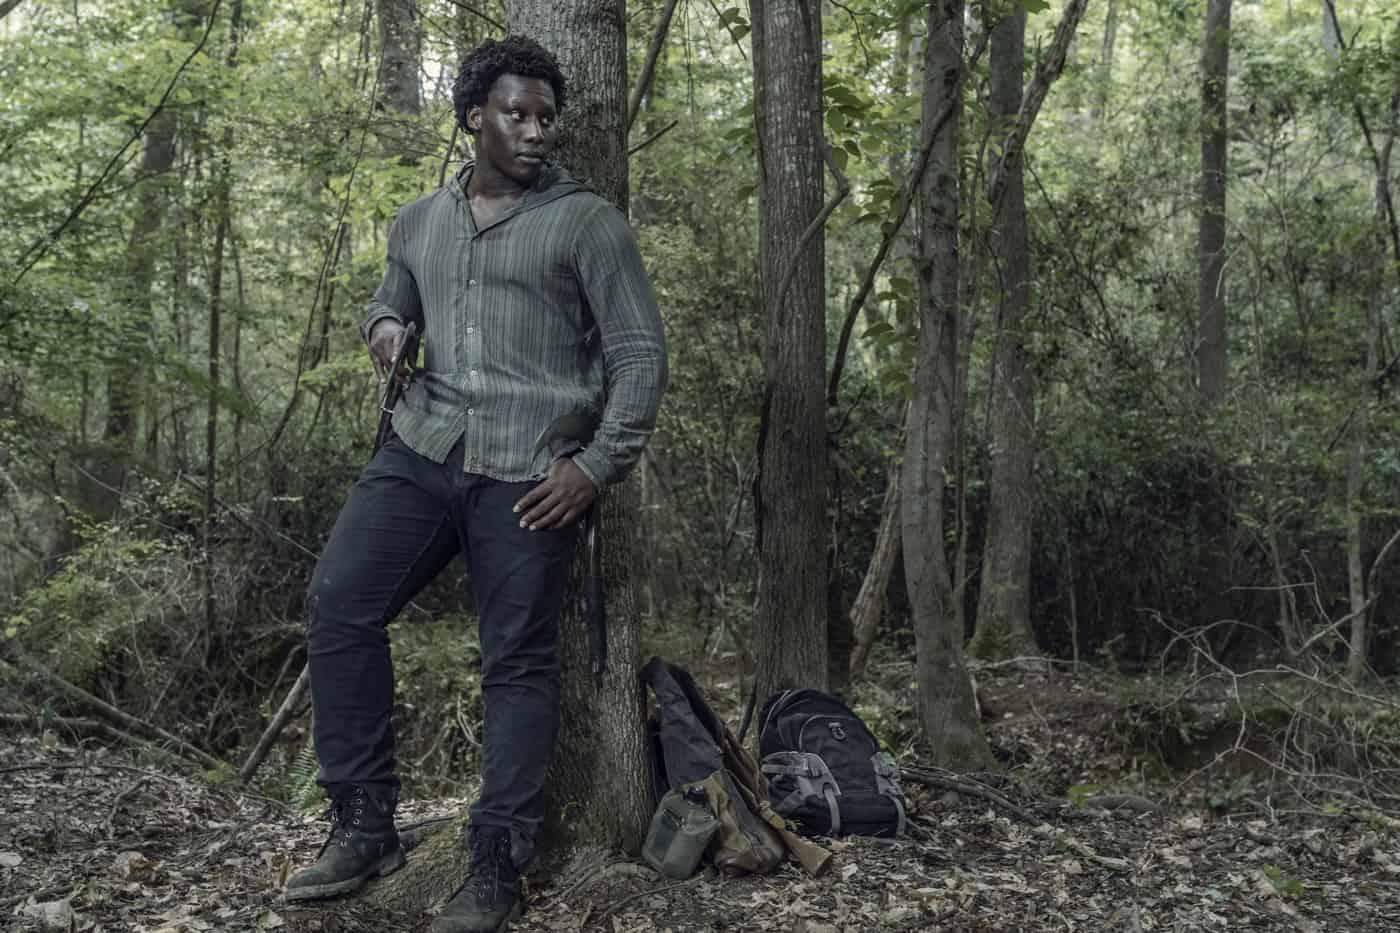 THE WALKING DEAD Season 11 Episode 7 Okea Eme-Akwari as Elijah - The Walking Dead _ Season 11, Episode 7 - Photo Credit: Josh Stringer/AMC